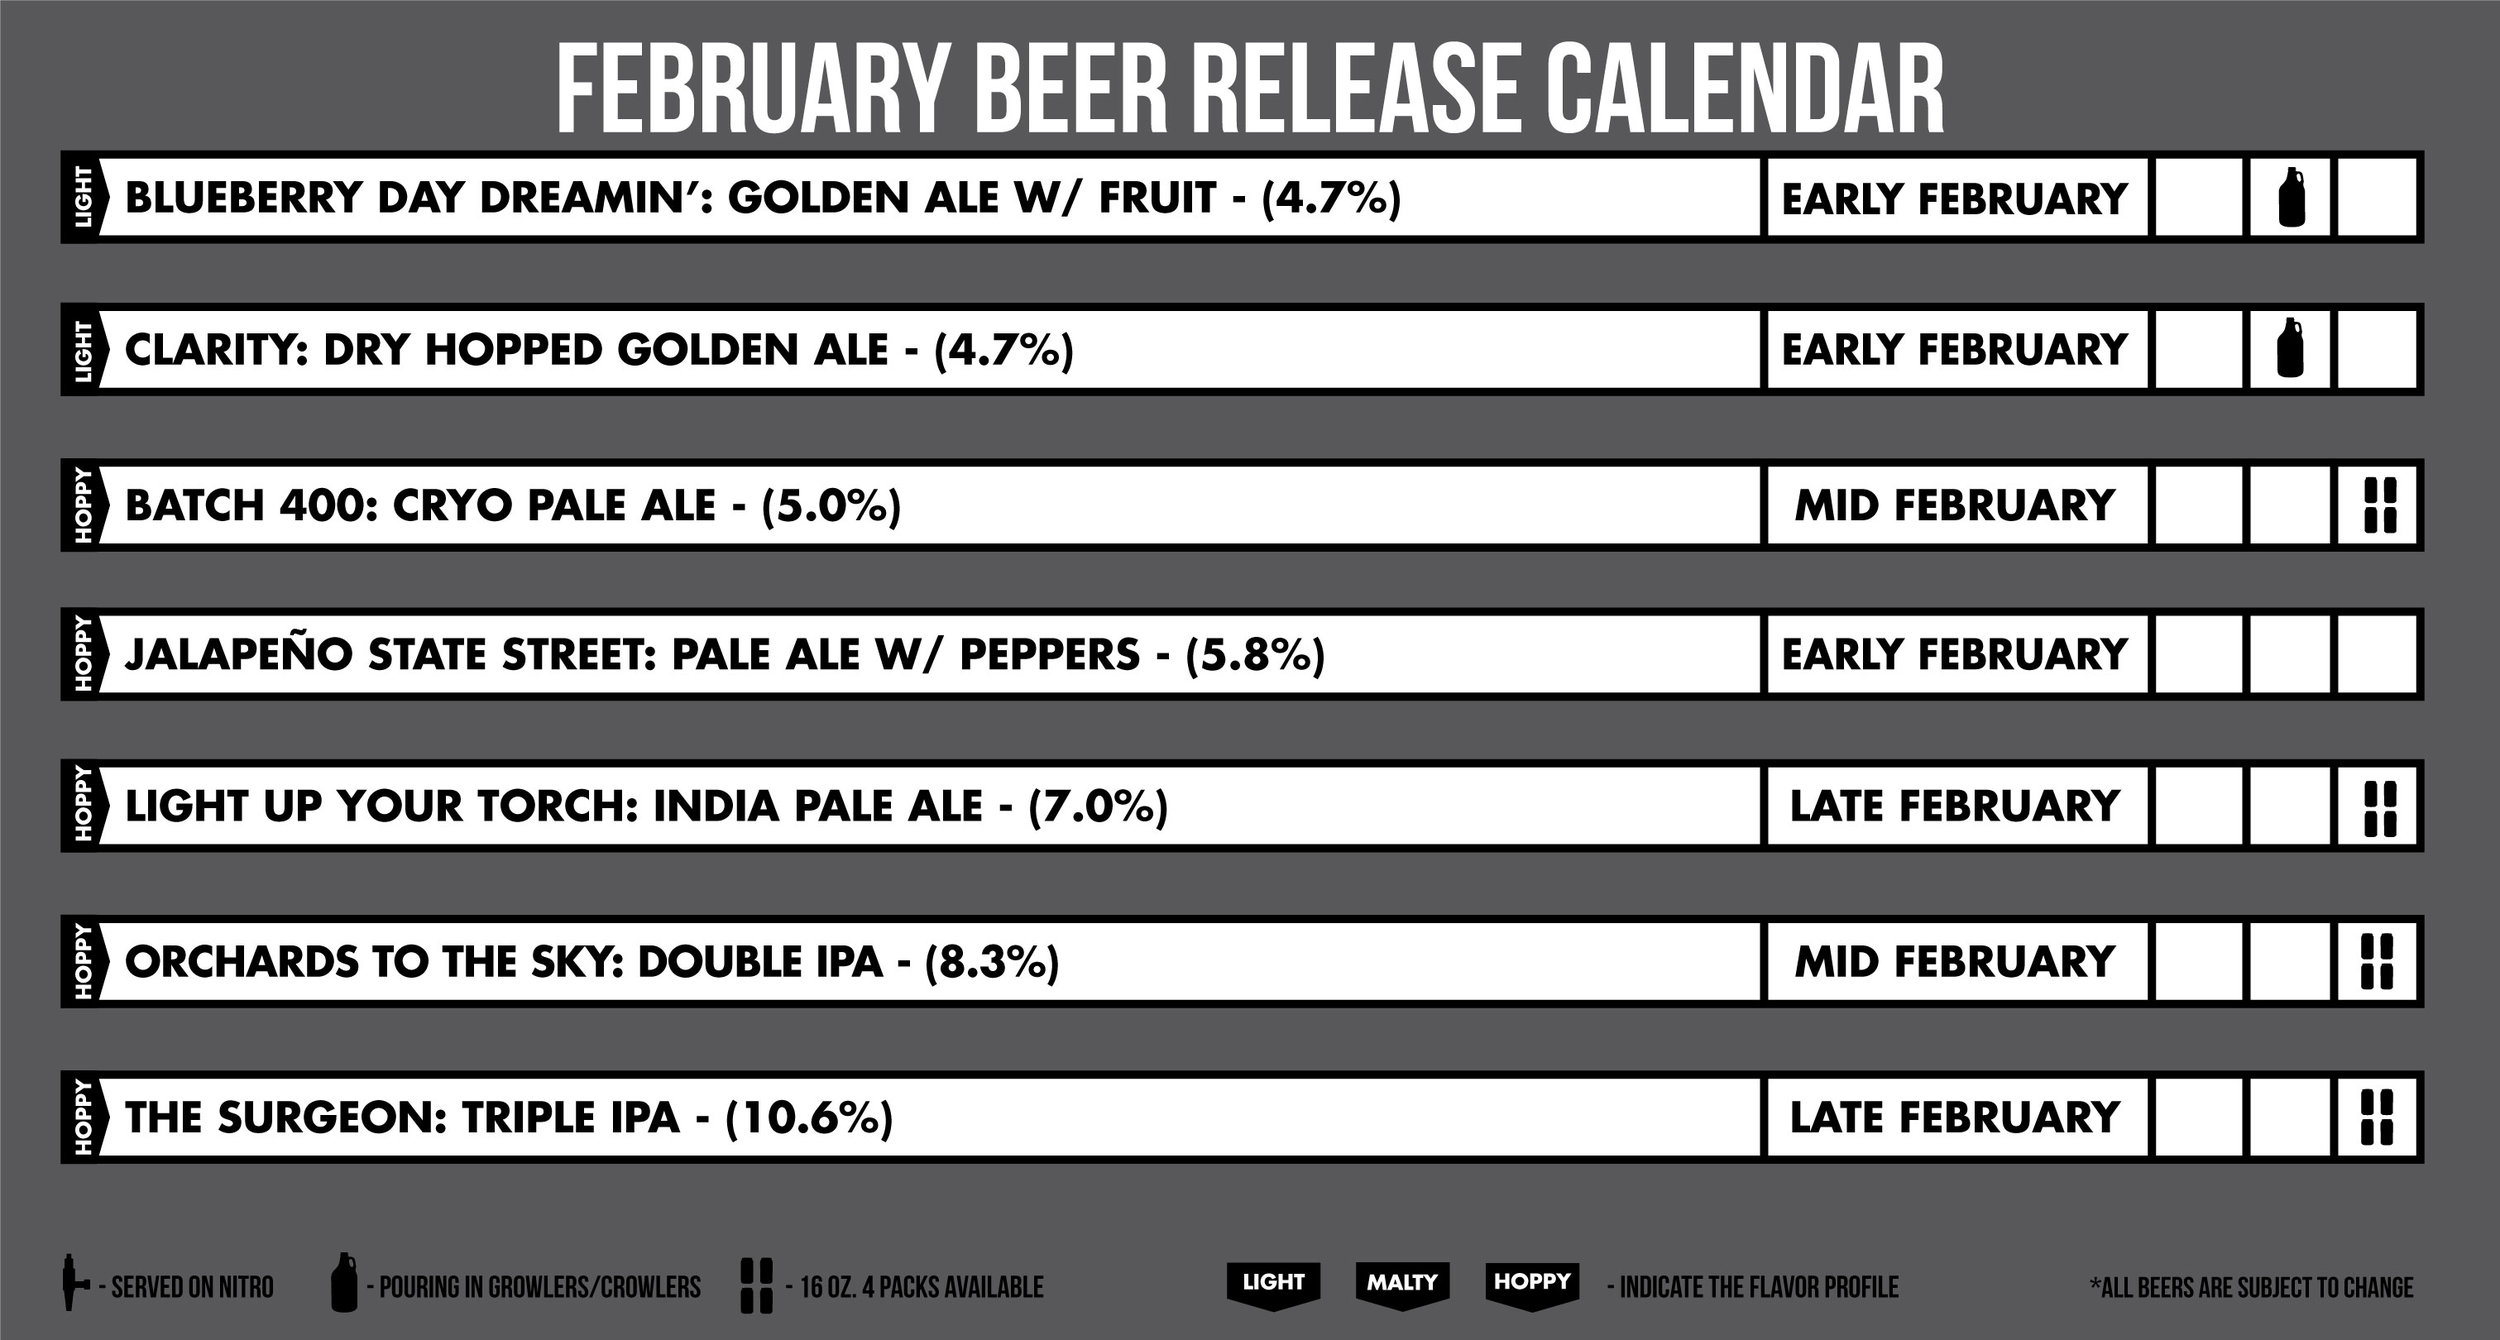 February_beer_release_calendar.jpg